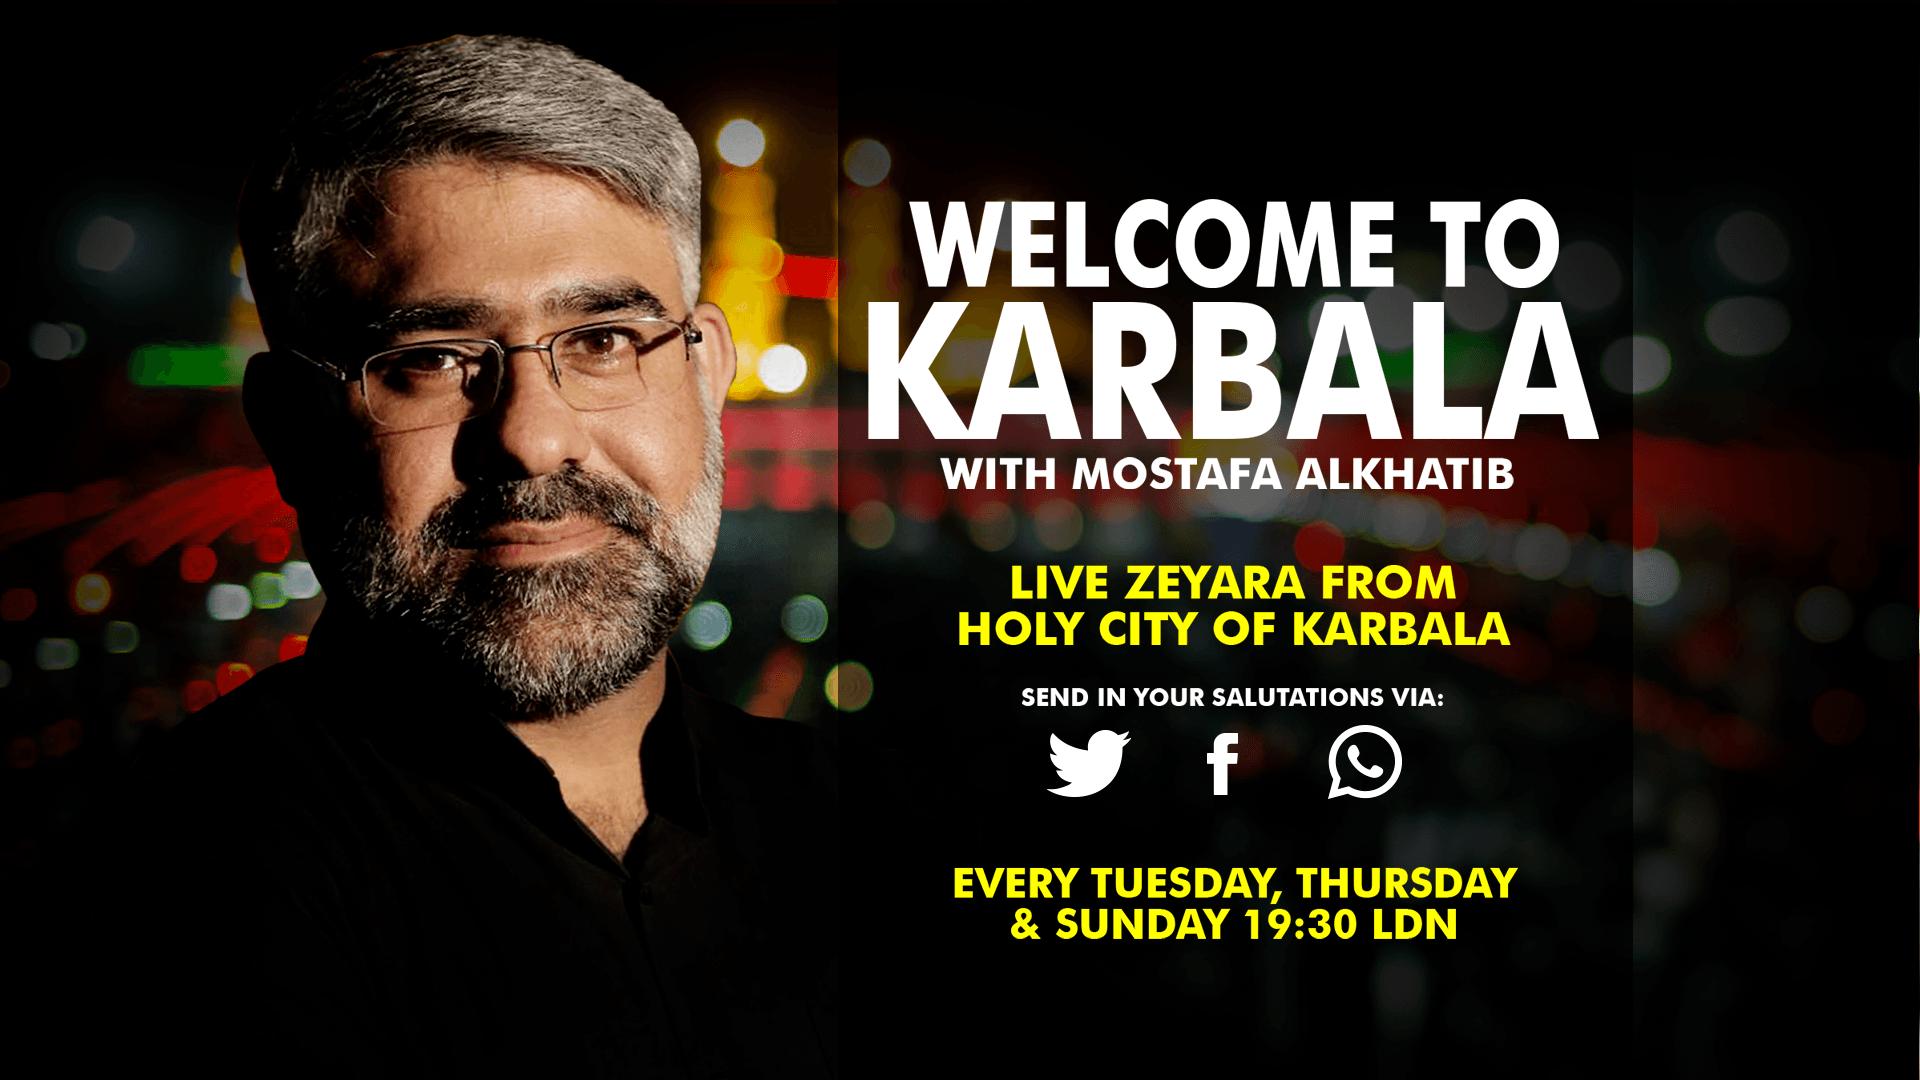 Imam Hussein 3 TV – Your gateway to Karbala